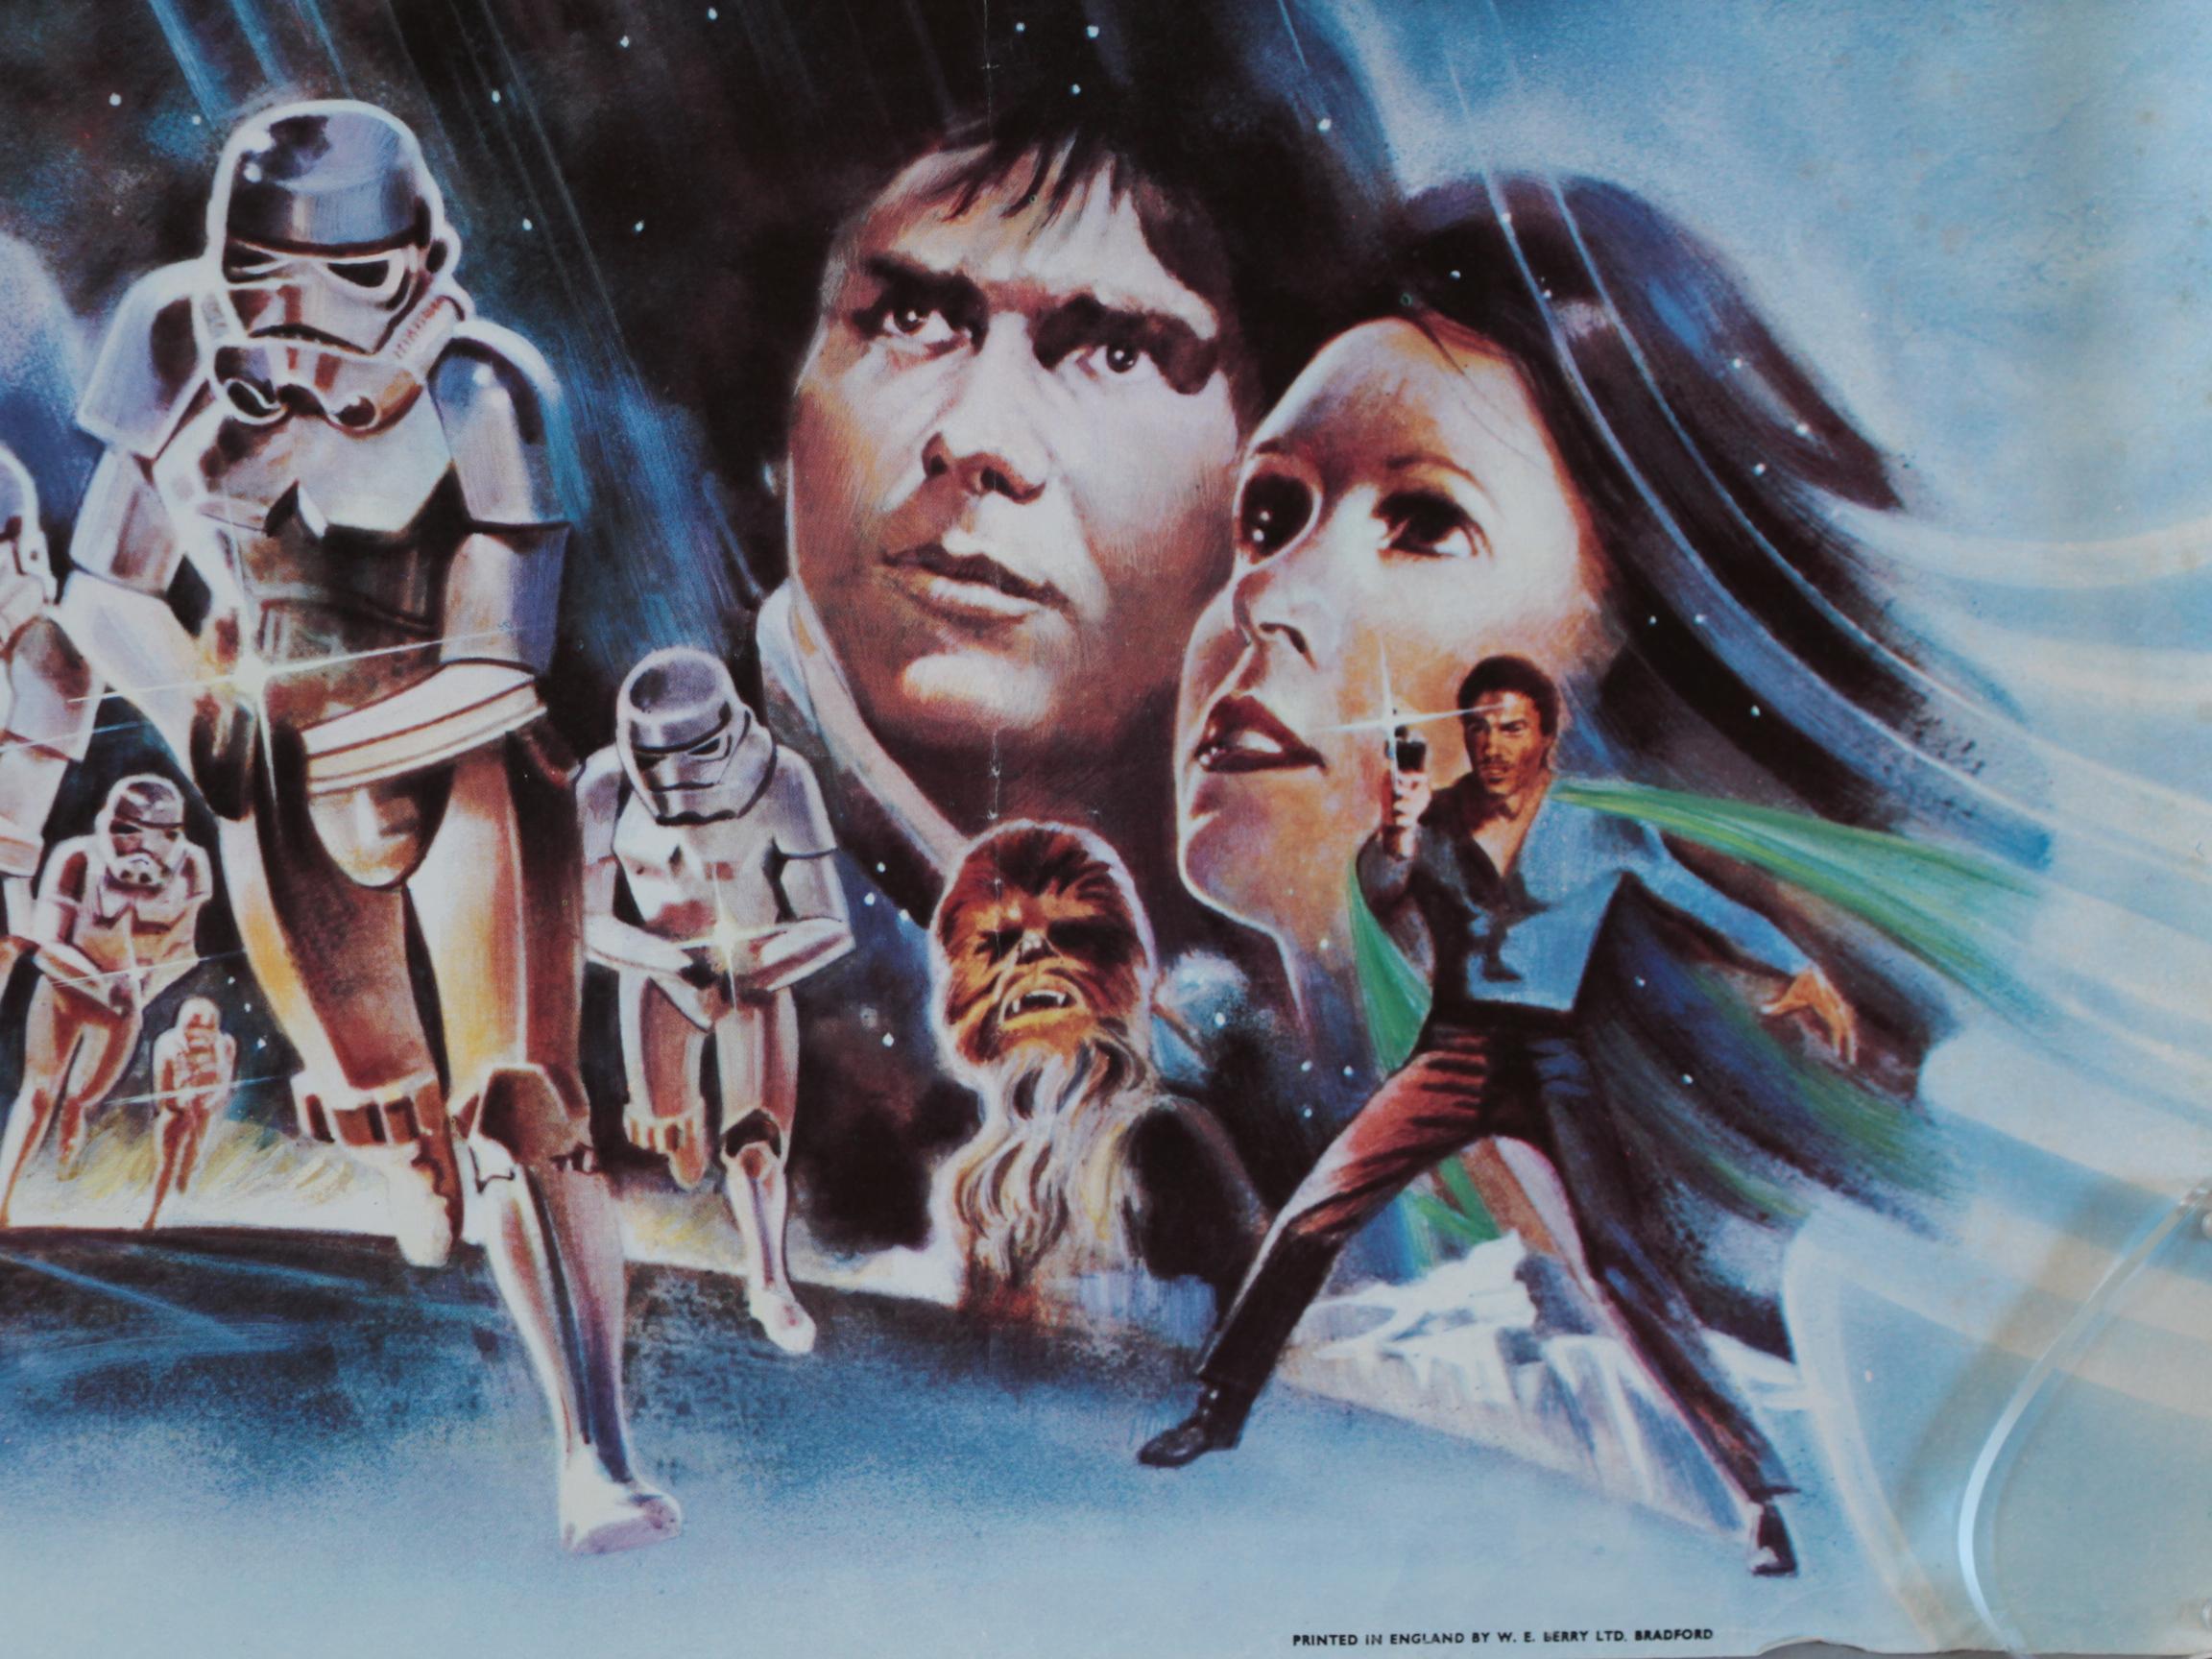 Lot 40 - The Empire Strikes Back original 1980 Star Wars British Quad film poster with artwork of Darth